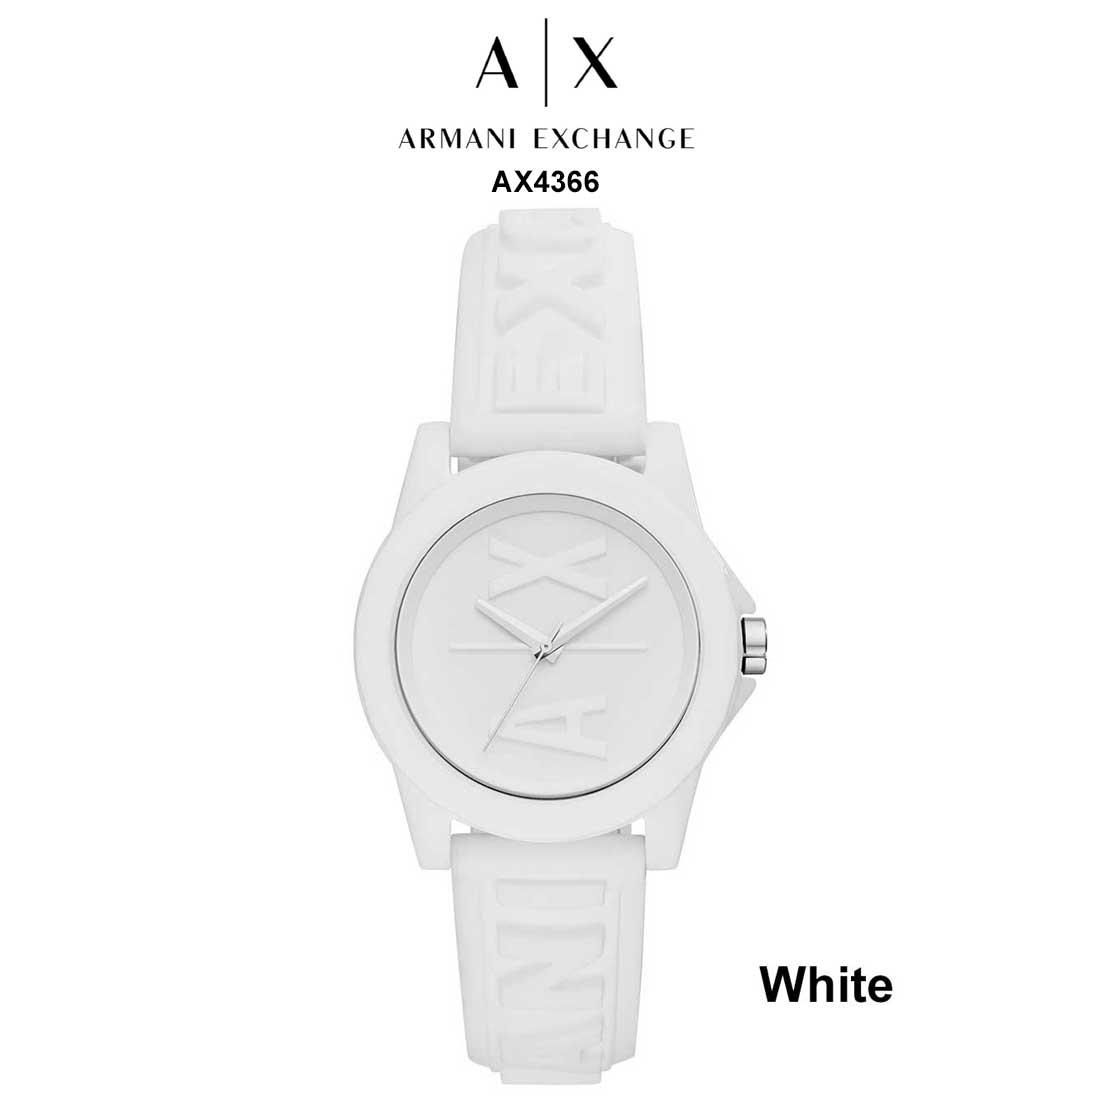 ARMANI EXCHANGE(アルマーニエクスチェンジ)A|X レディース 防水 腕時計 シリコンバンド クオーツ アナログ AX4366